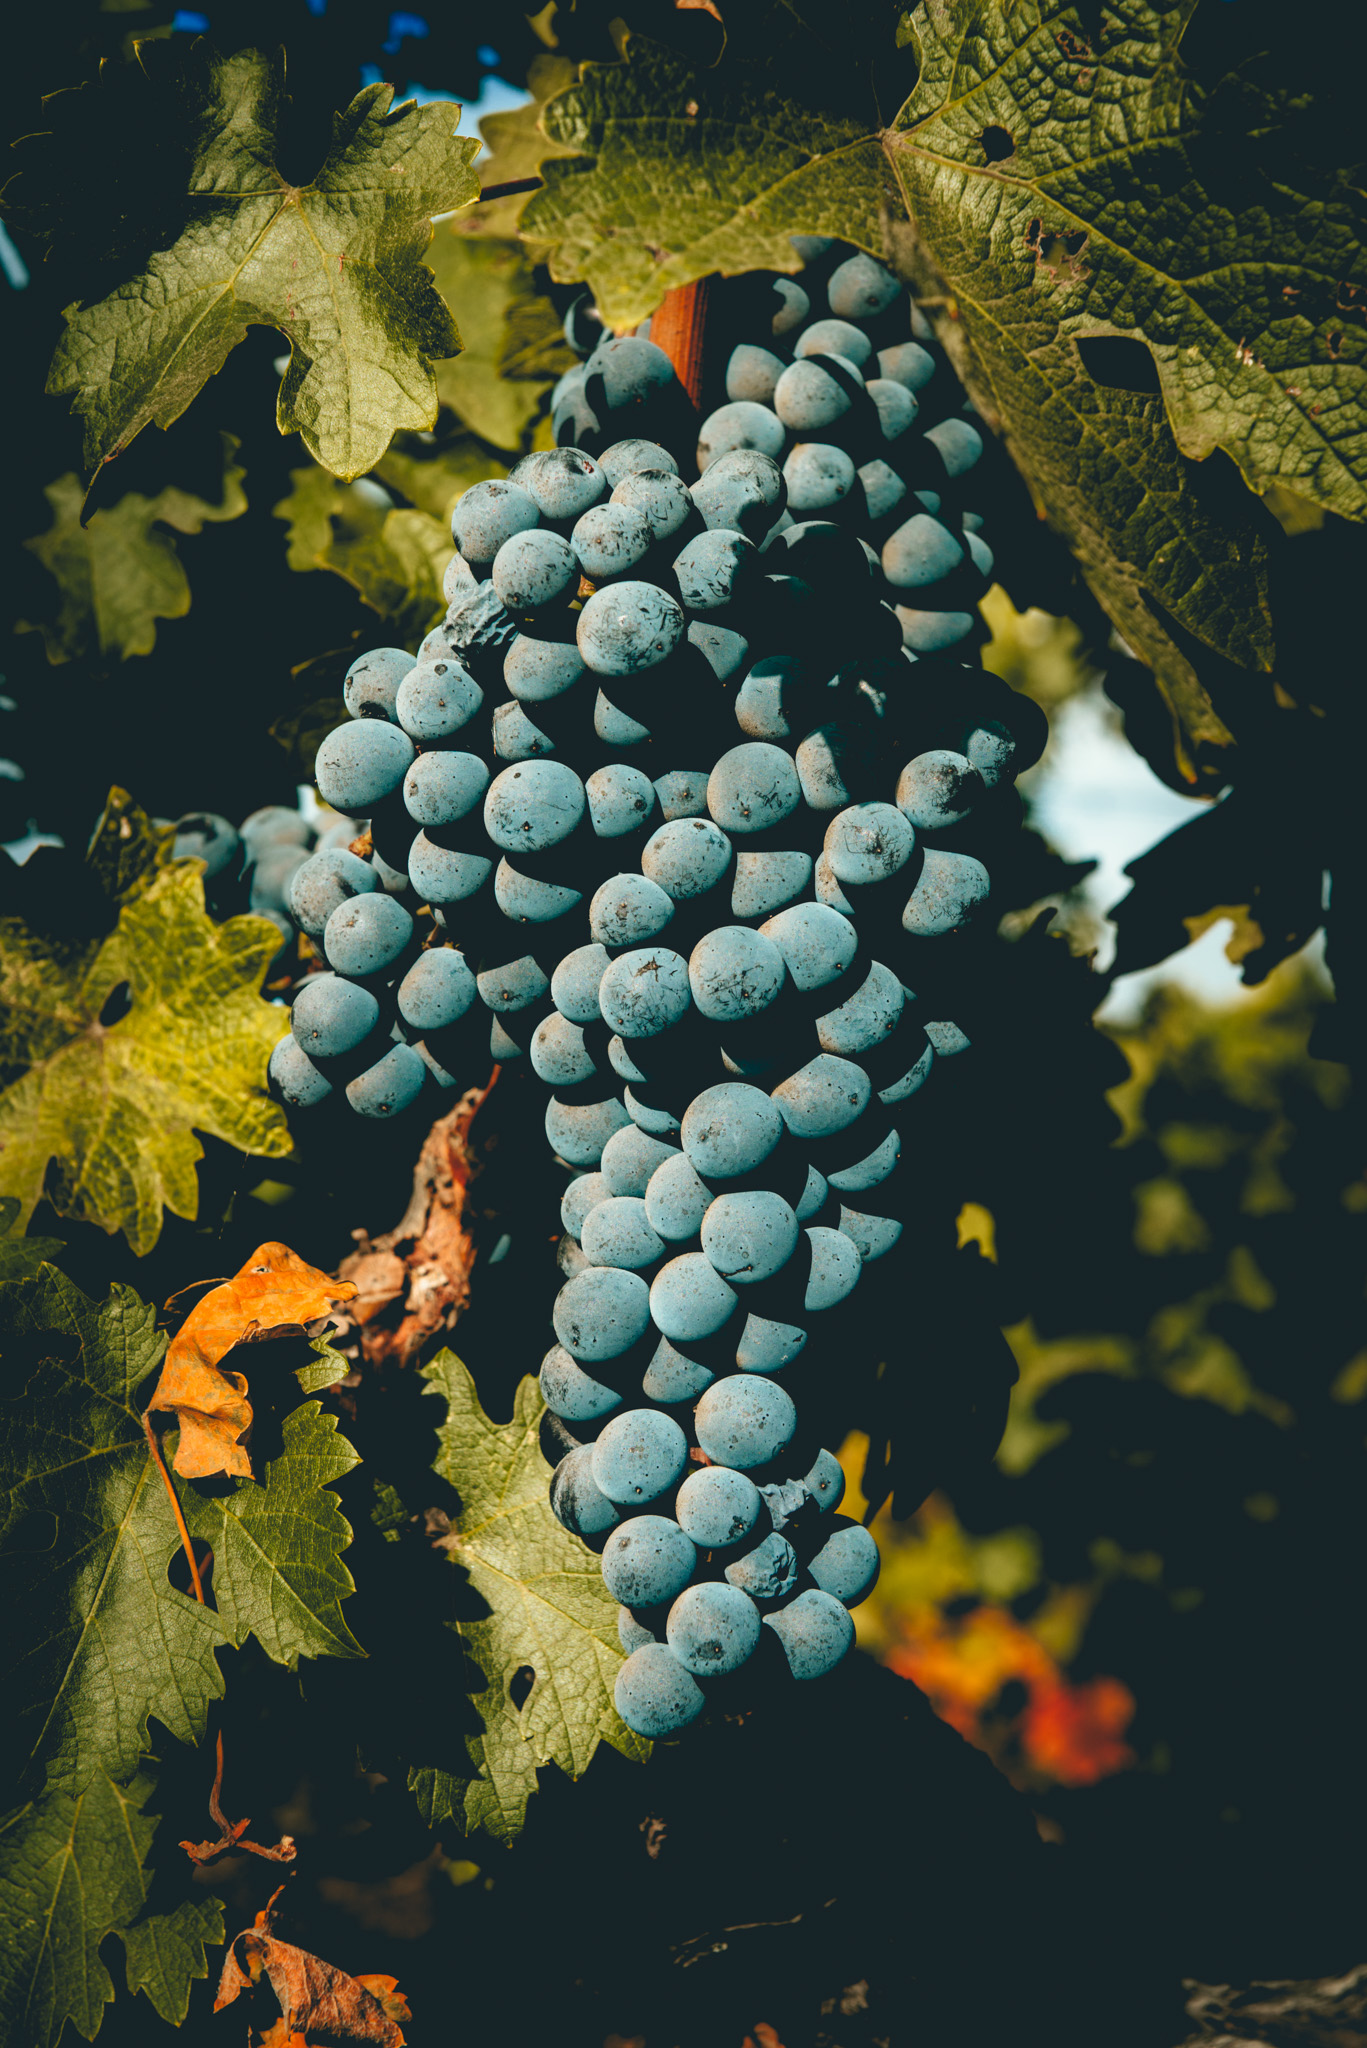 California : Napa Valley : Beckstoffer To-Kalon vineyard in Oakville